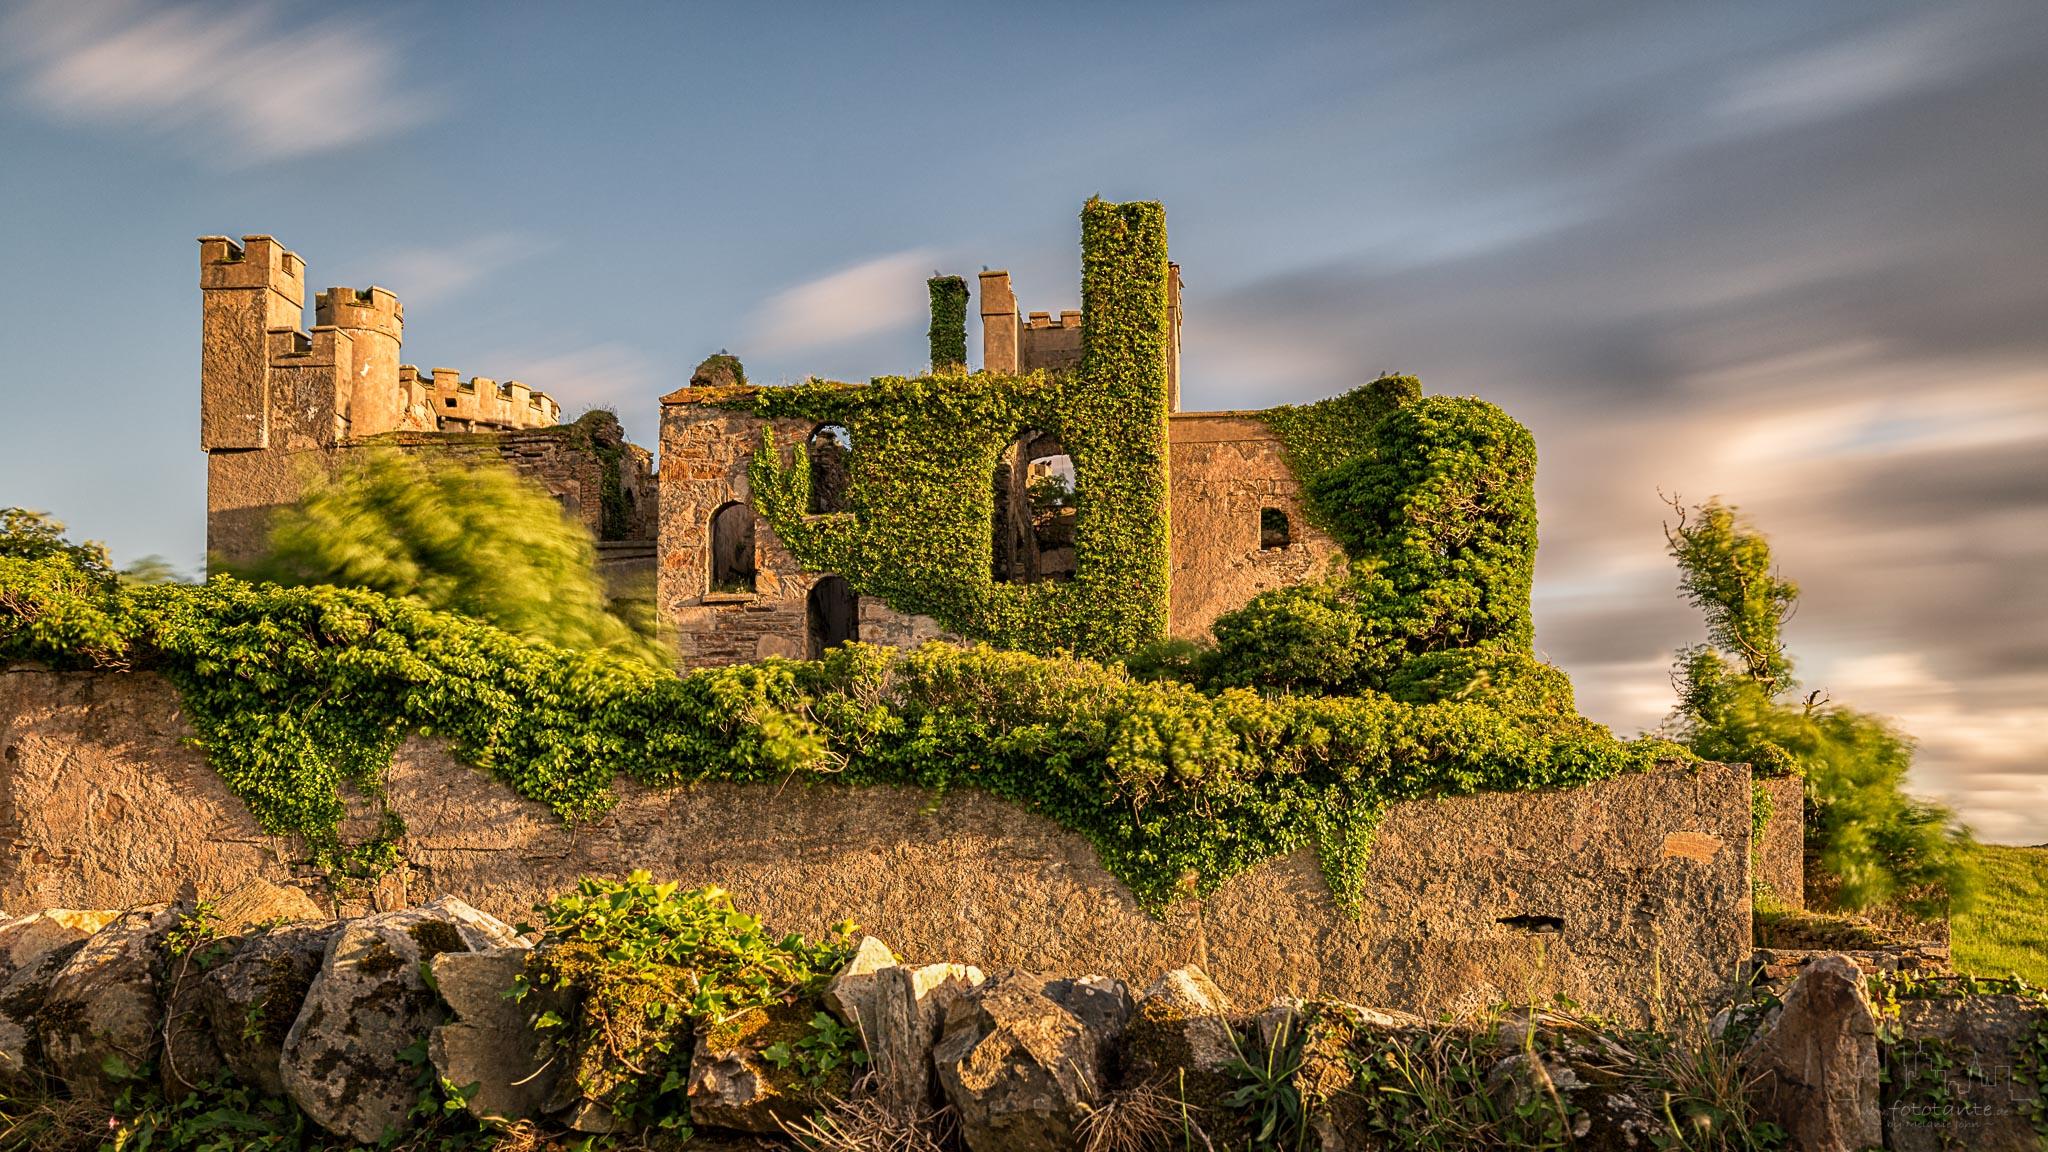 Back side of Clifden castle, Ireland